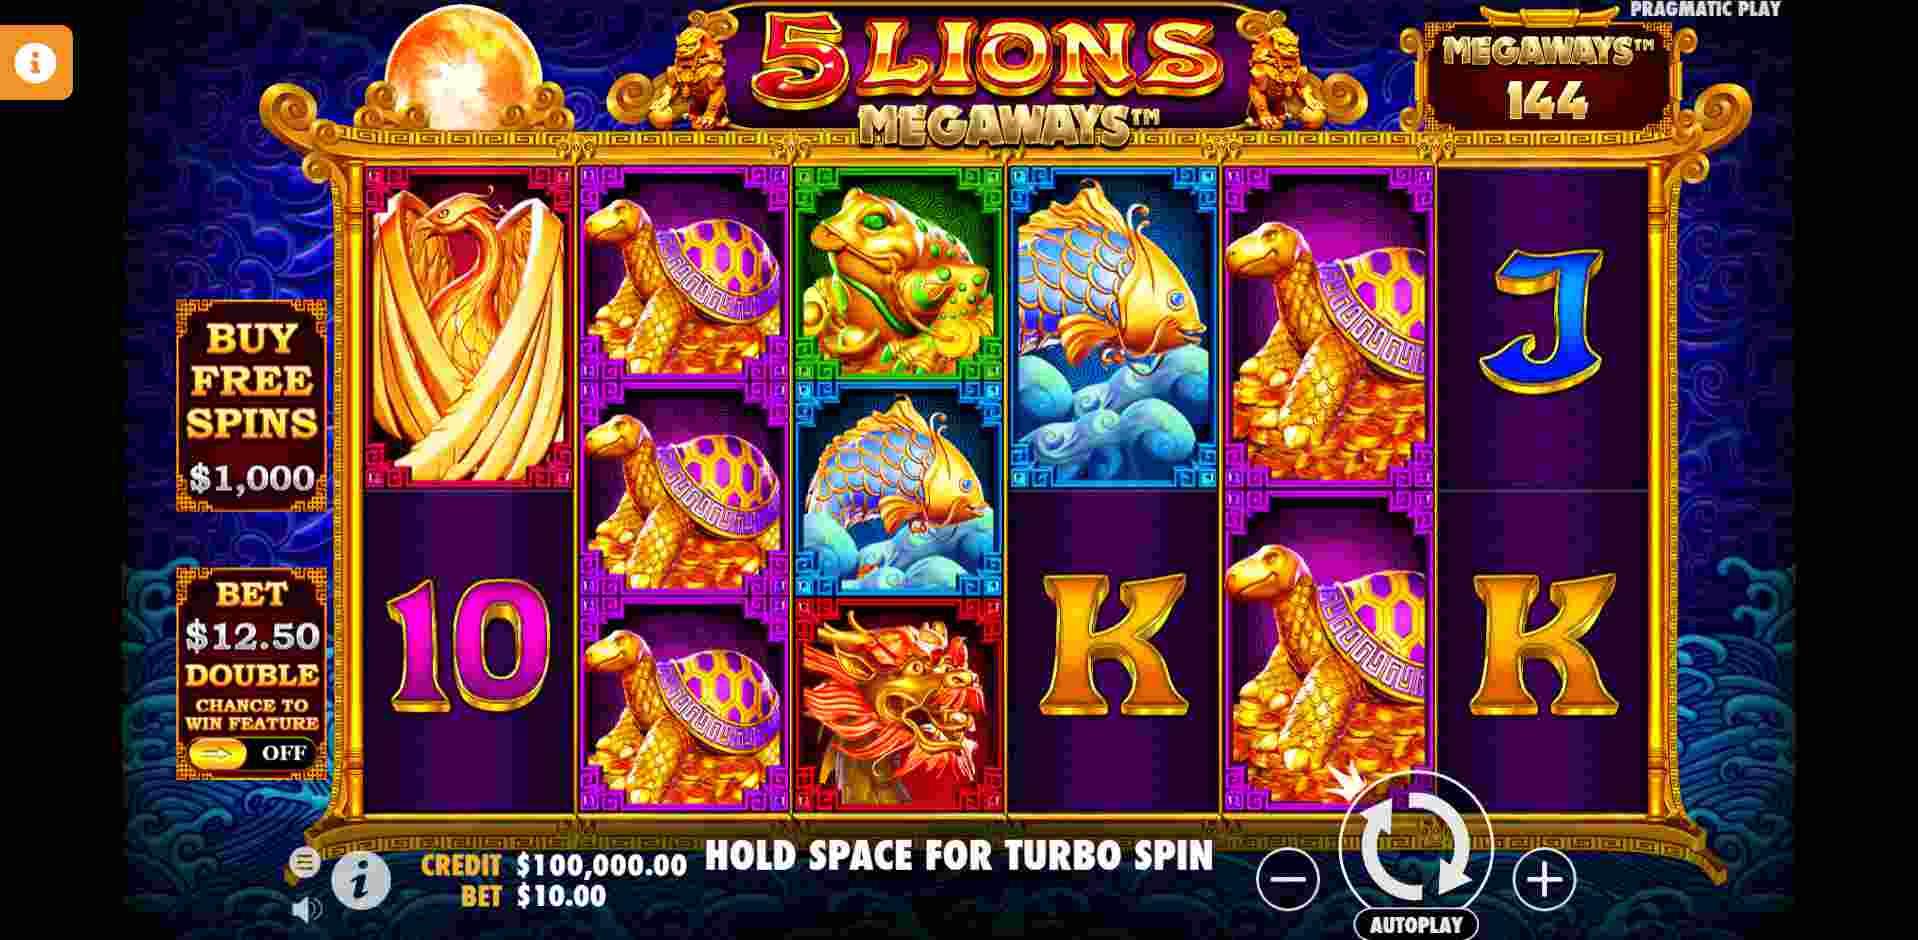 5 Lions Megaways Gameplay